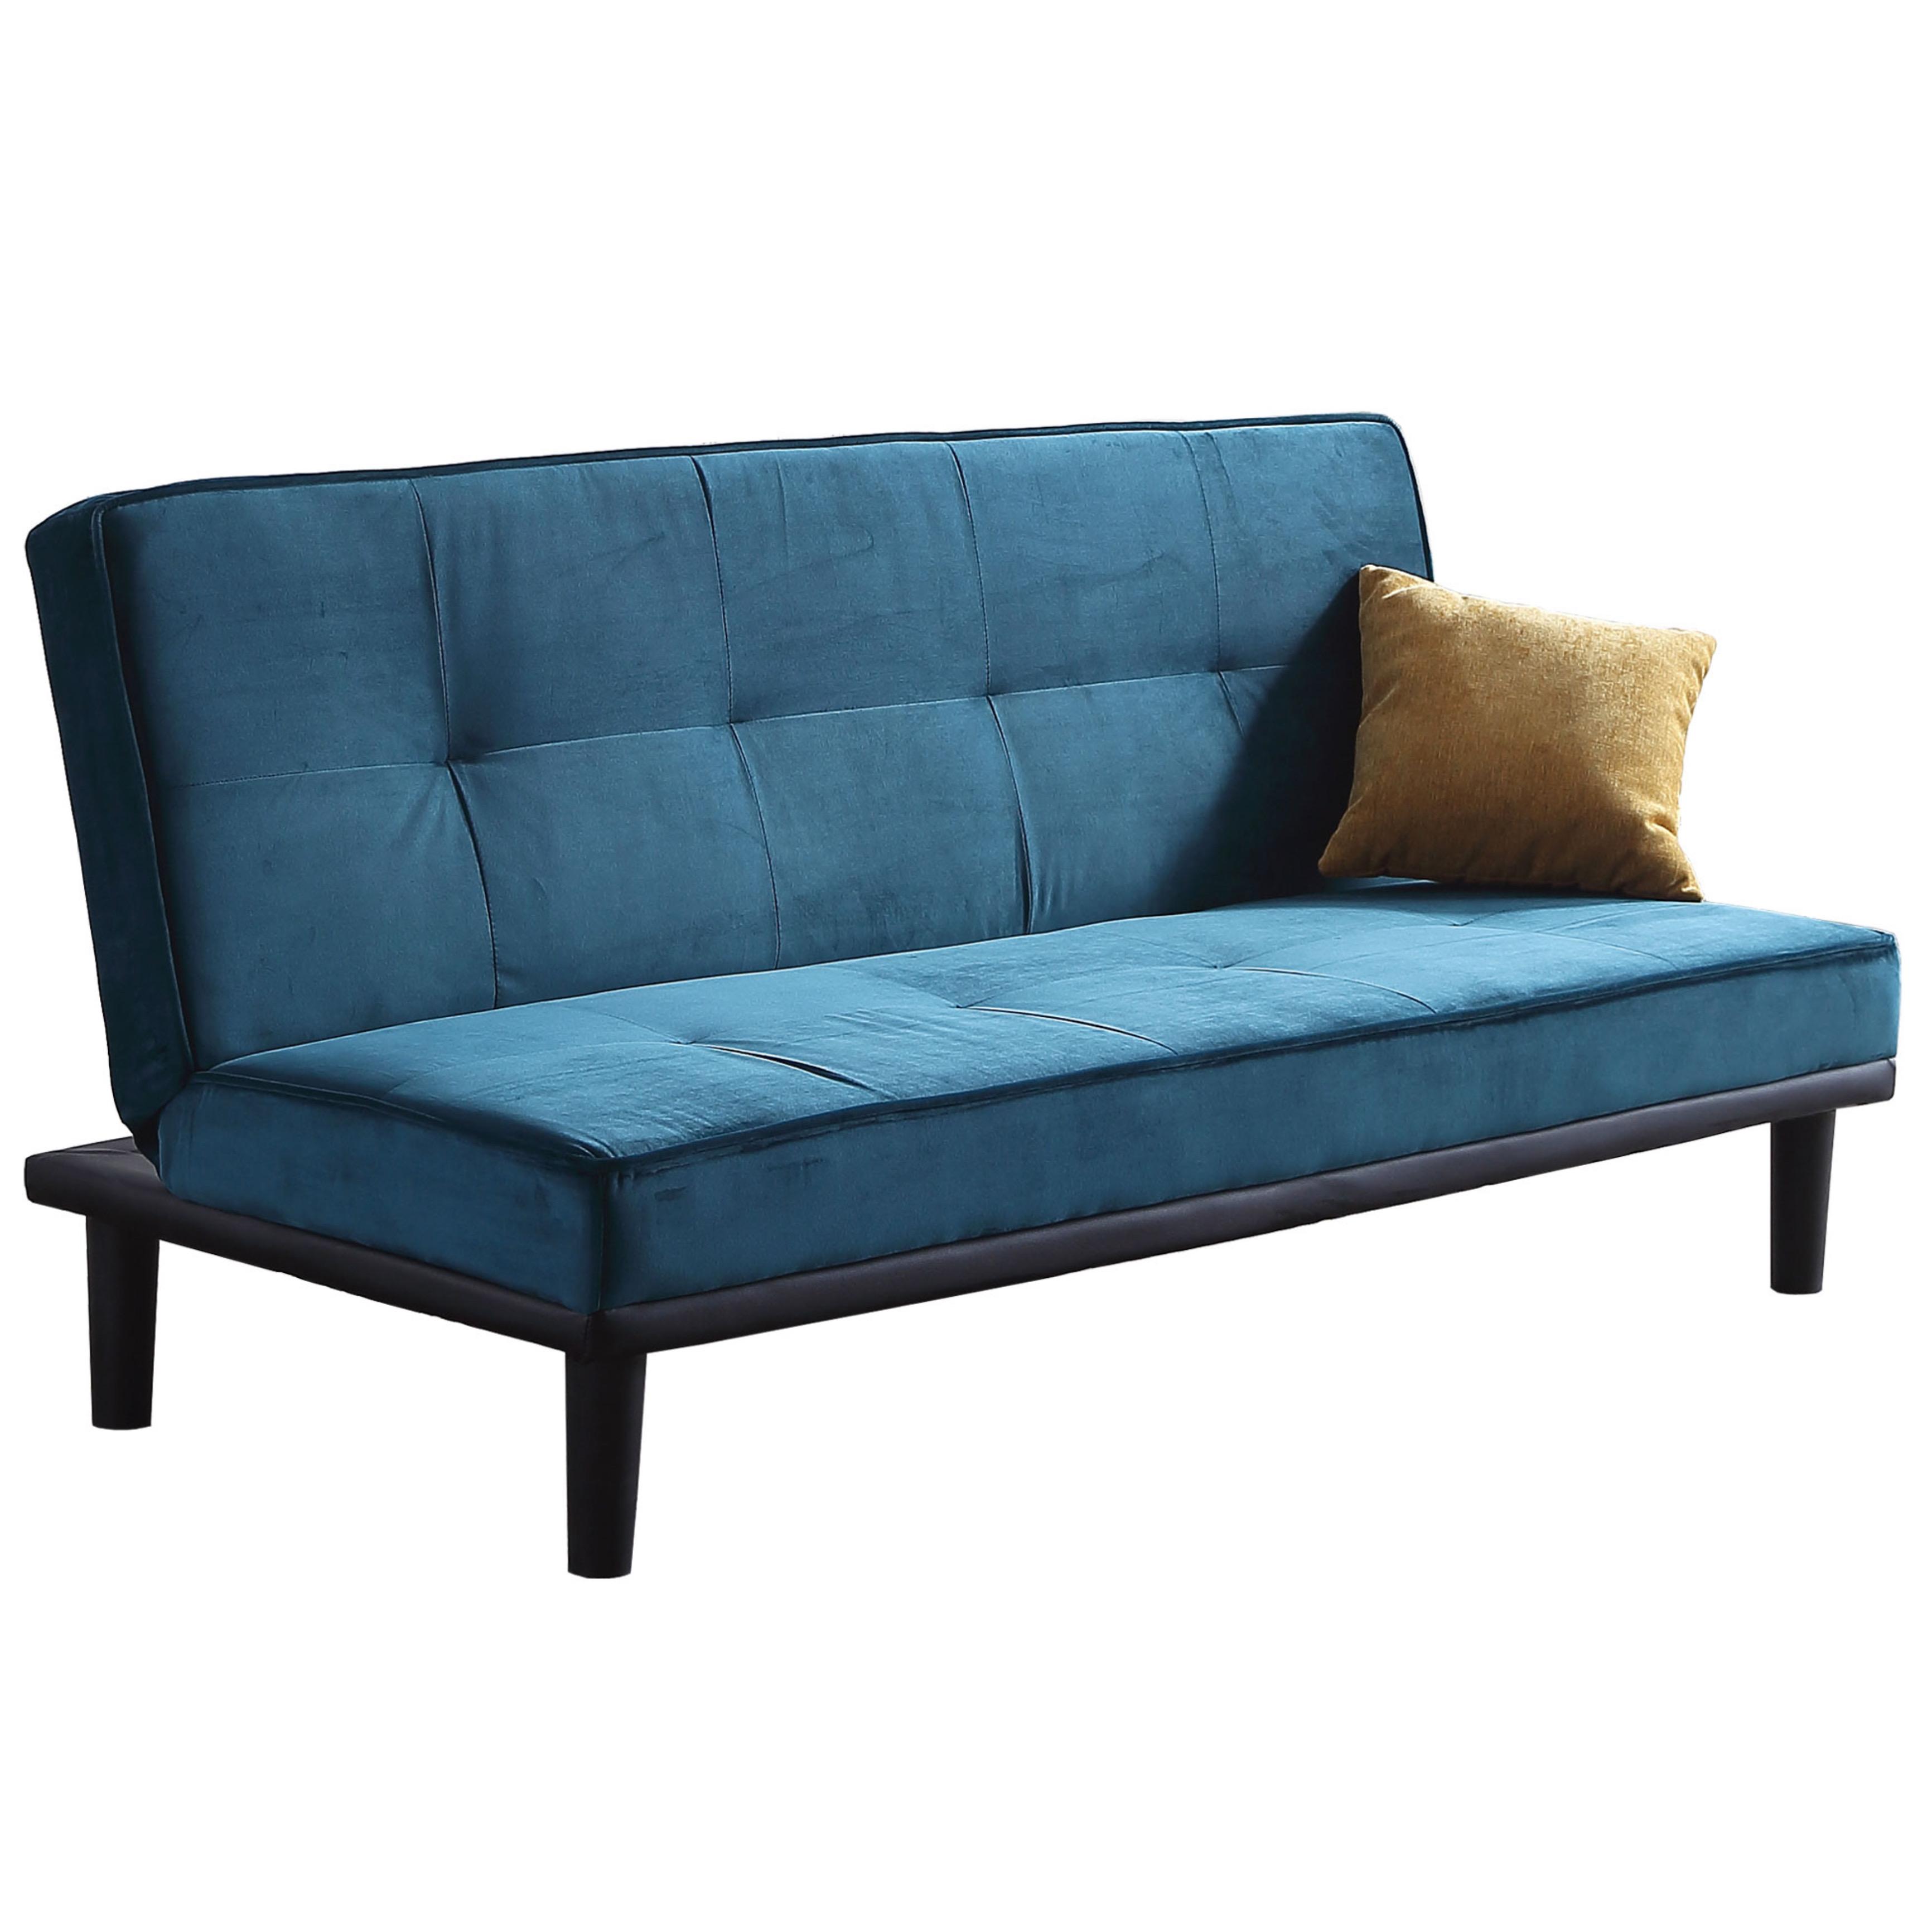 29536-sofa-cama-click-verde-aguamarina.jpeg